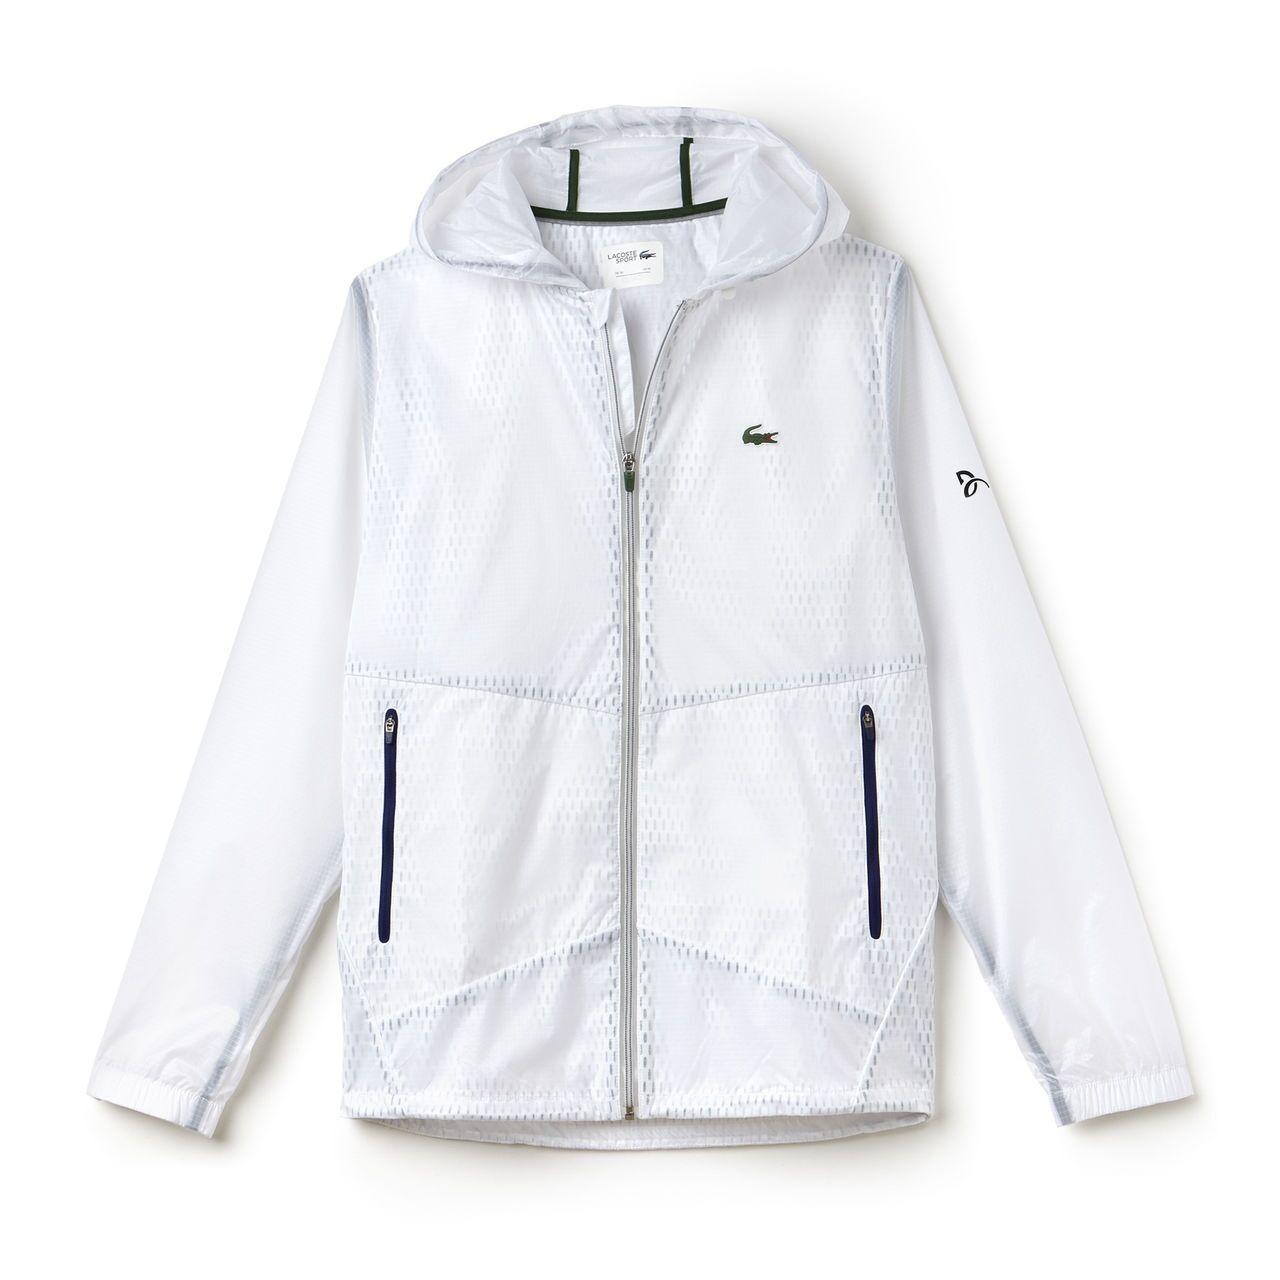 Lacoste Novak Djokovic Jacket Exclusive Edition White S